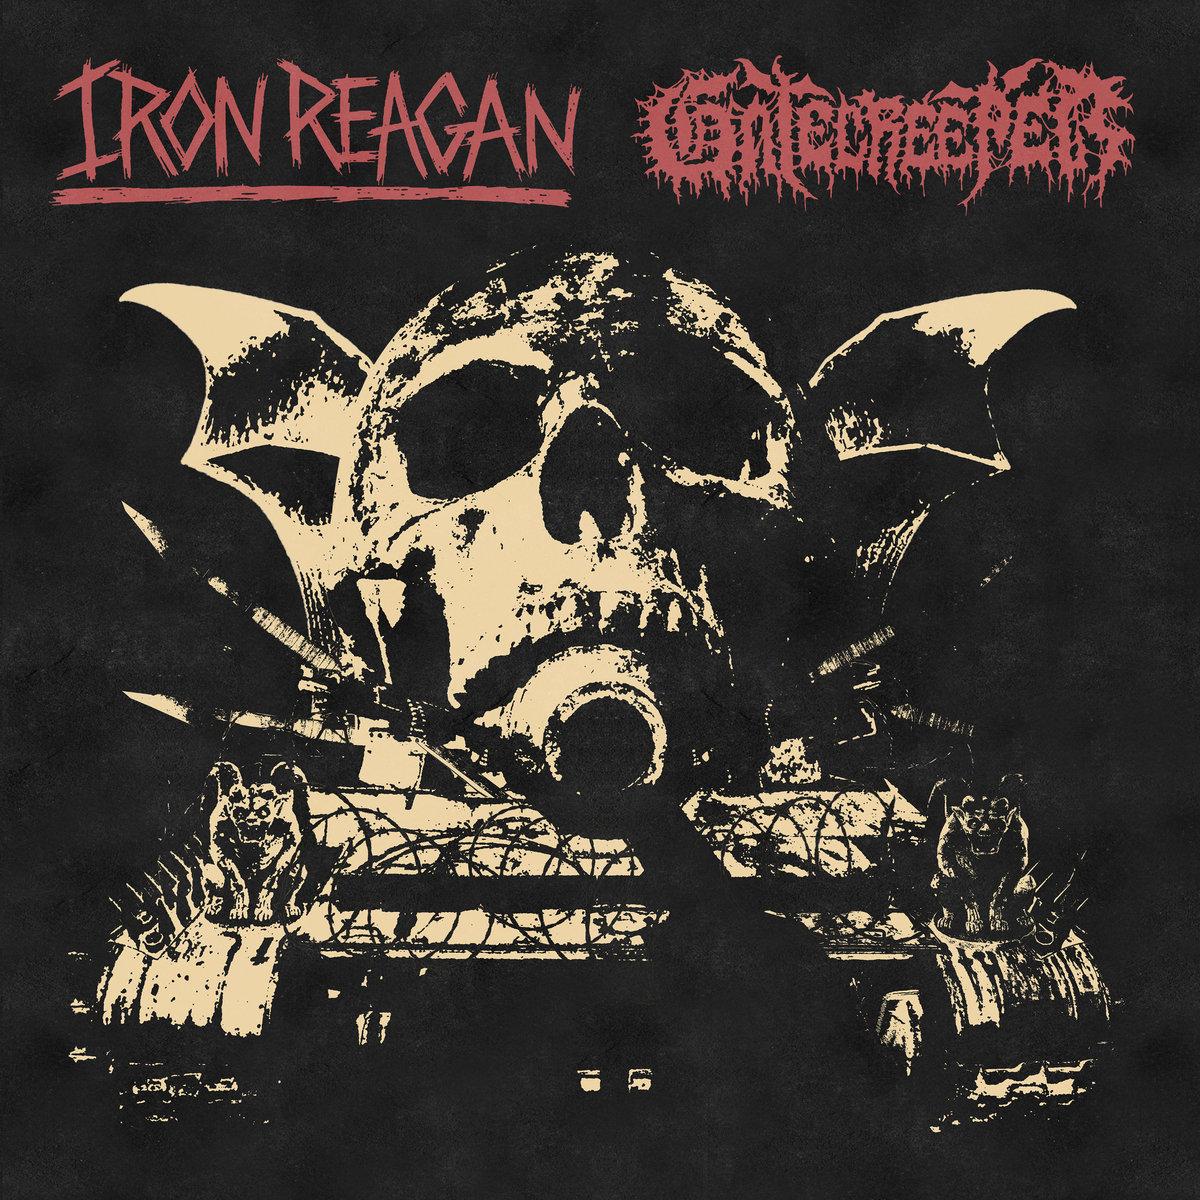 Gatecreeper-Iron Reagan.jpg